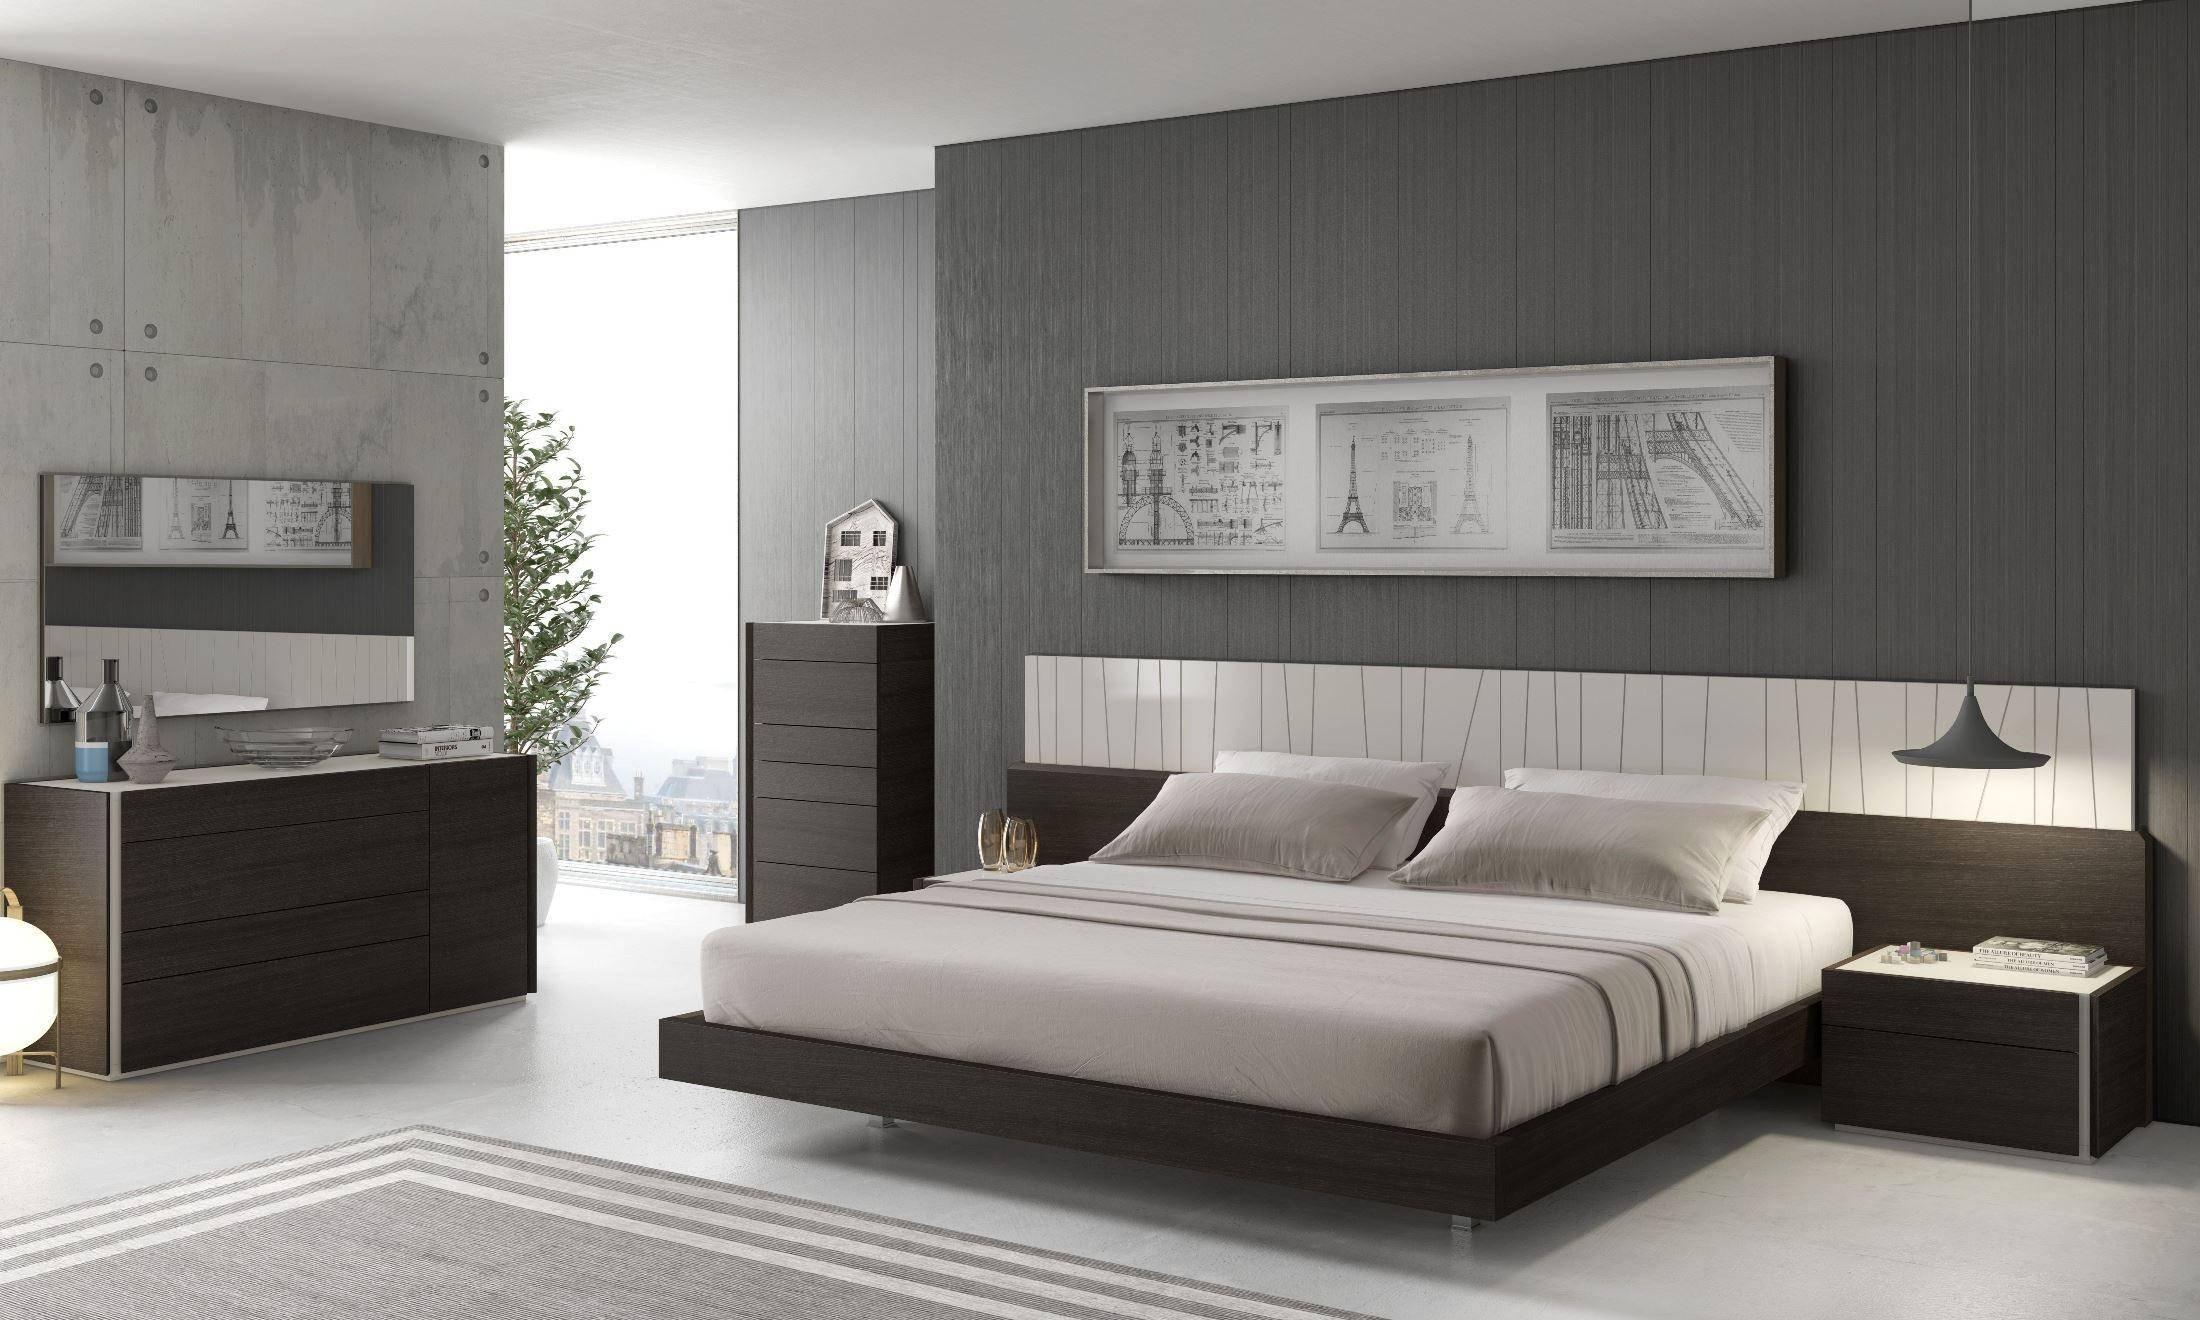 Picture of: Buy Orren Ellis Elida King Platform Bedroom Set 4 Pcs In Wenge Wood Veneers Online